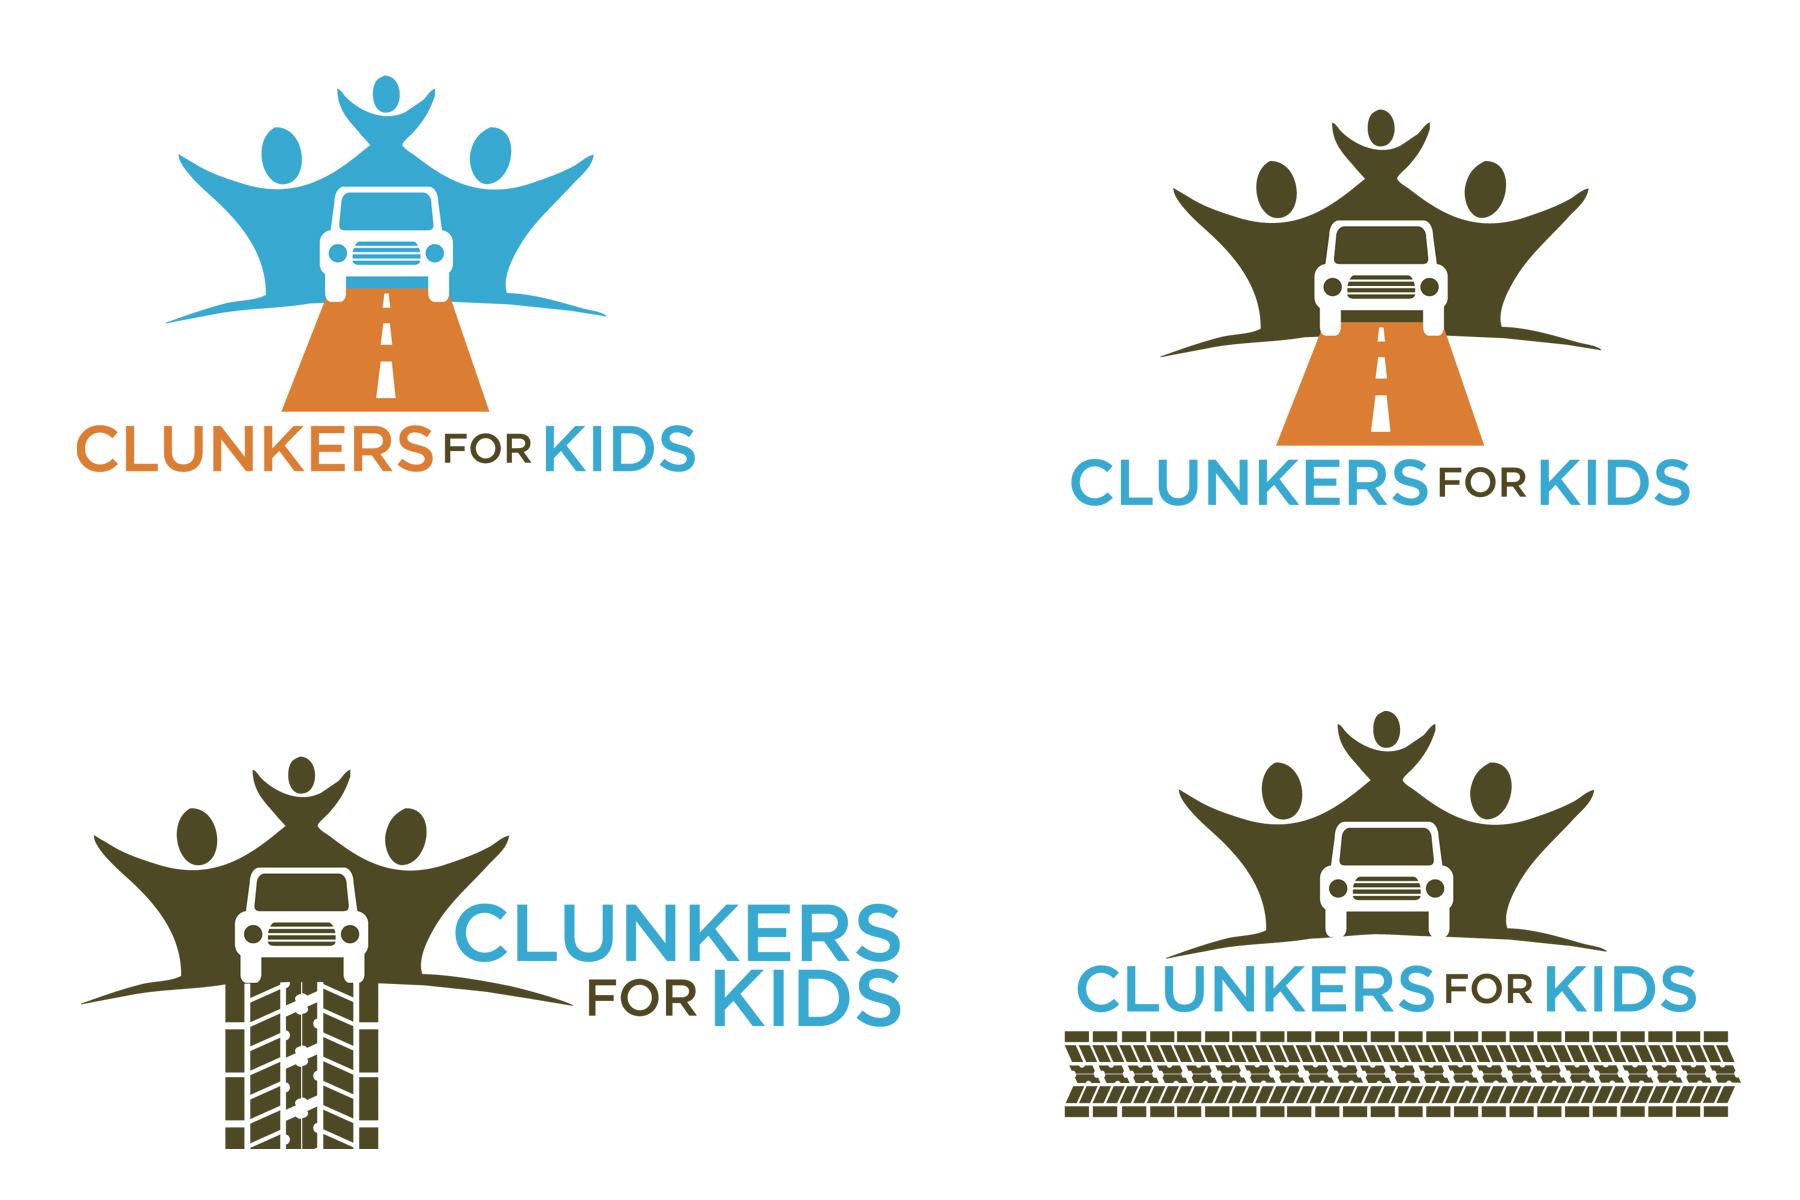 ClunkersforKids